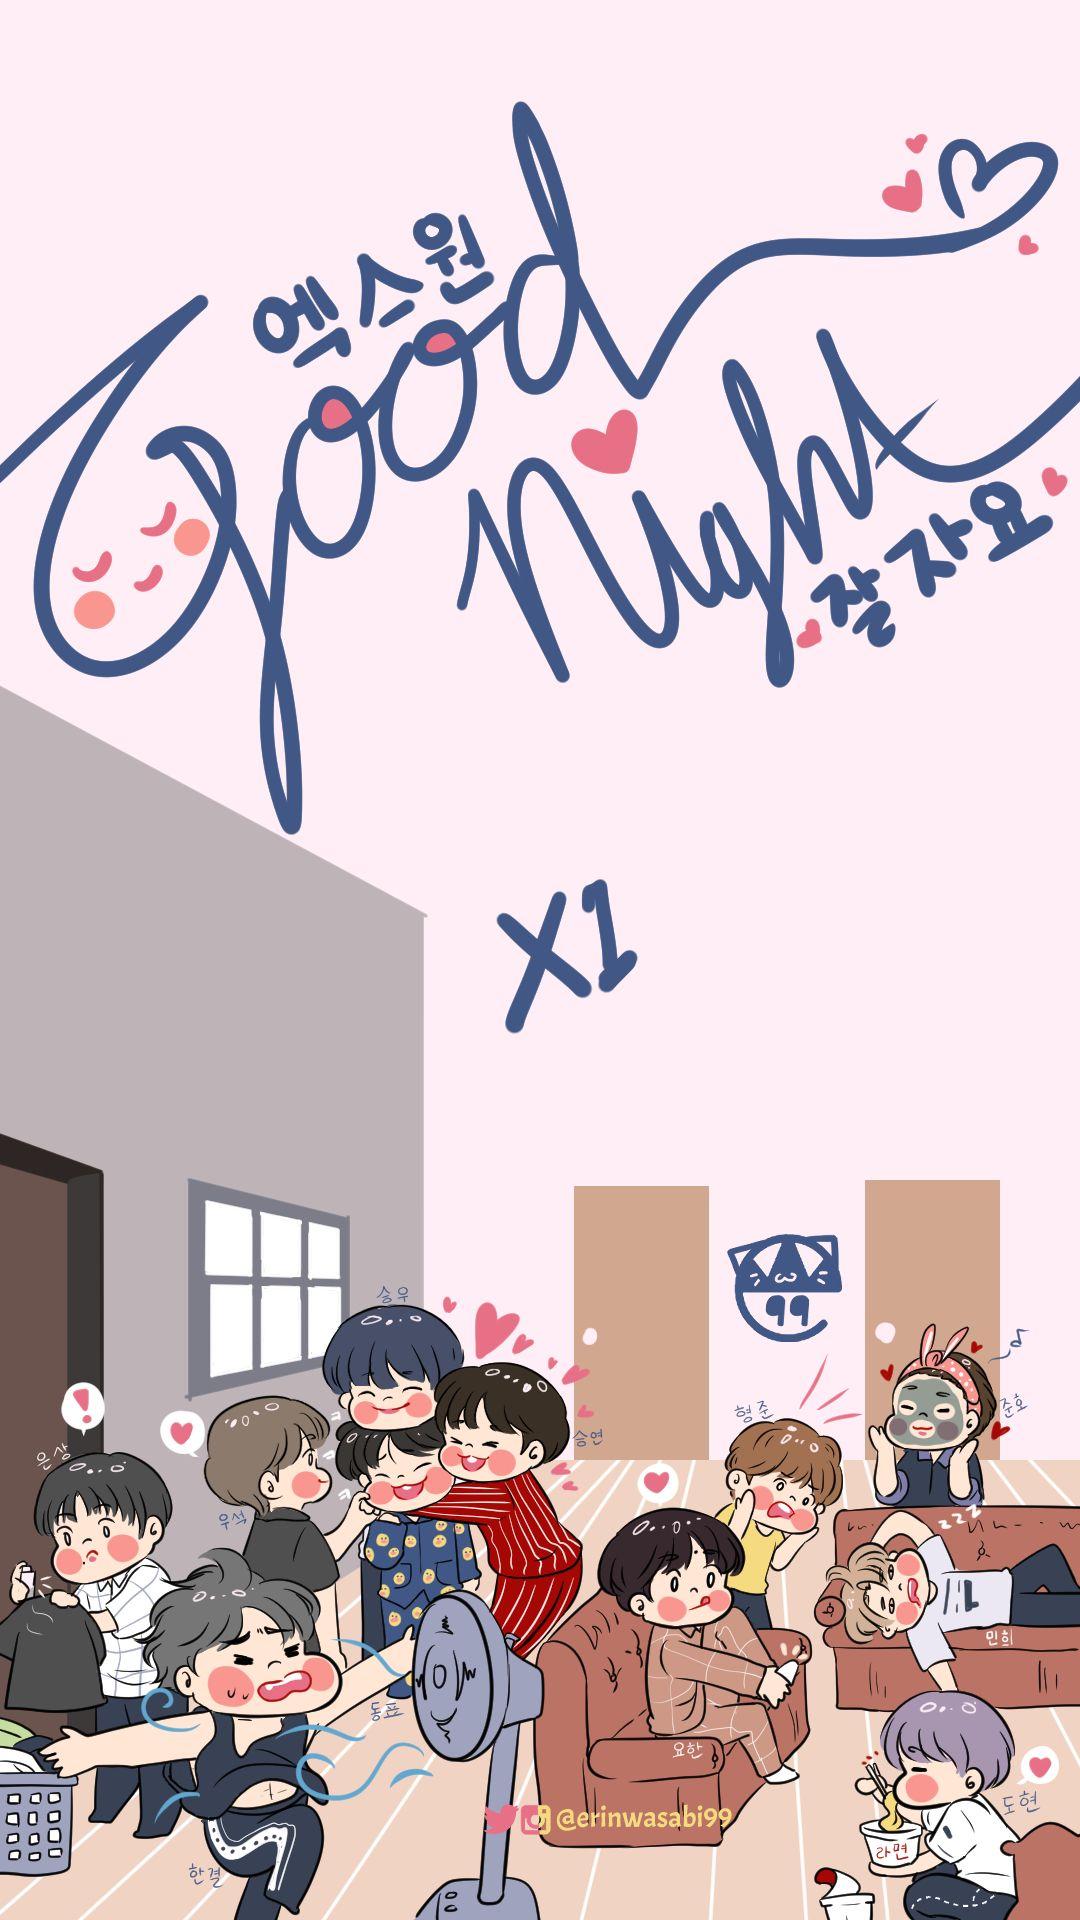 X1's night dorm activity